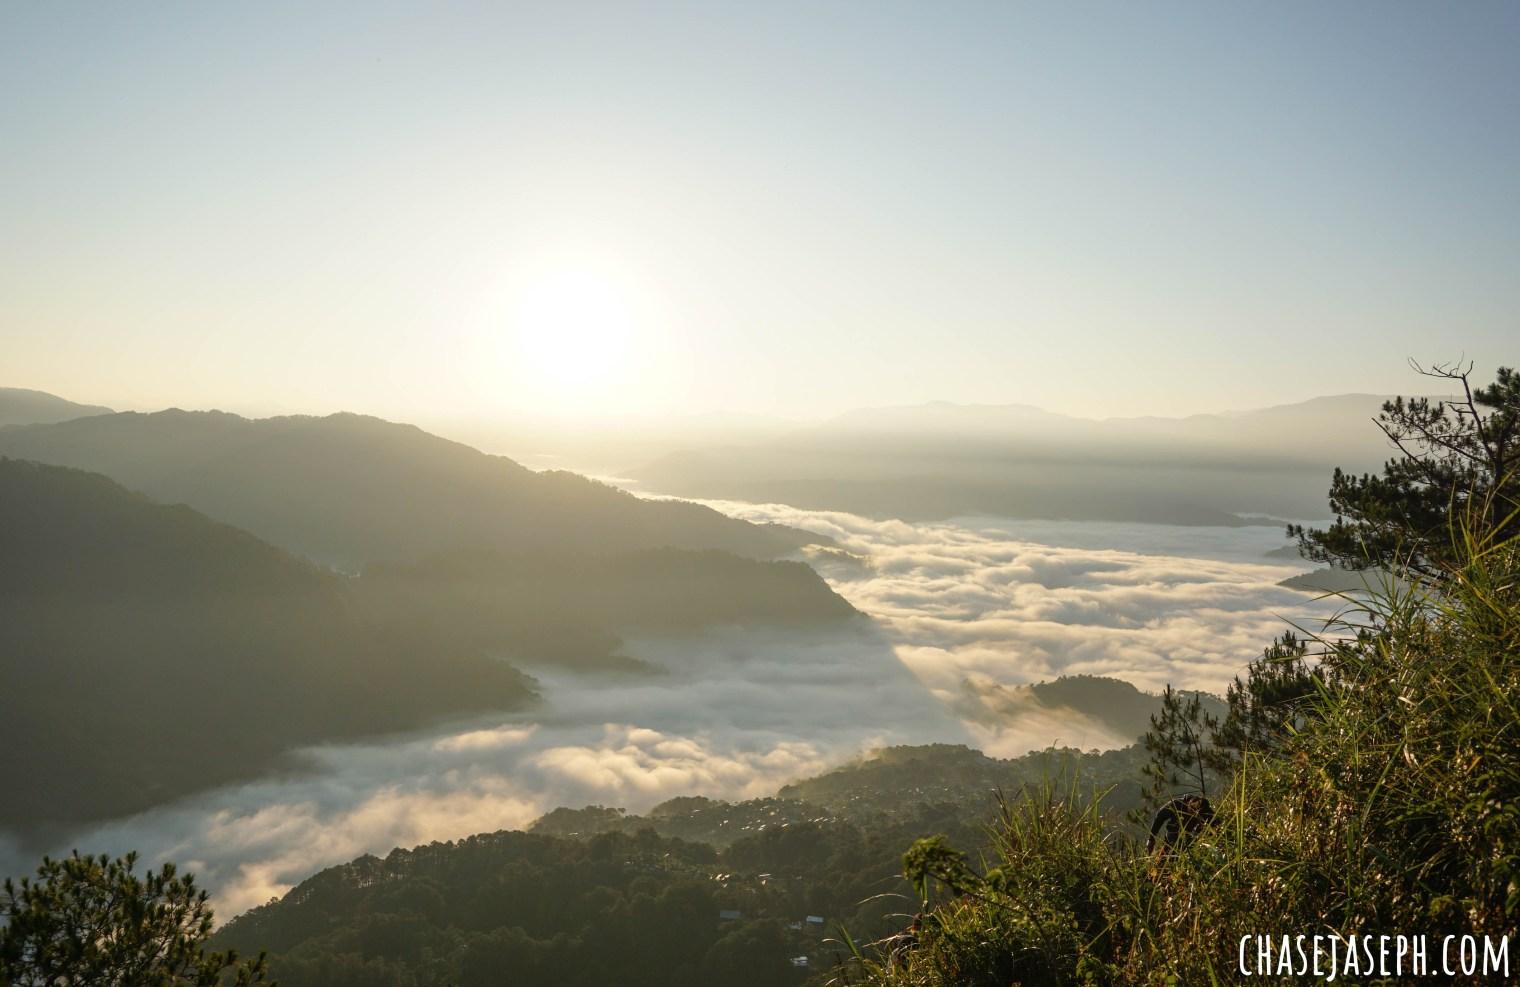 Cordilleras: Ifugao, Kalinga & Mountain Province (Travel Guide)